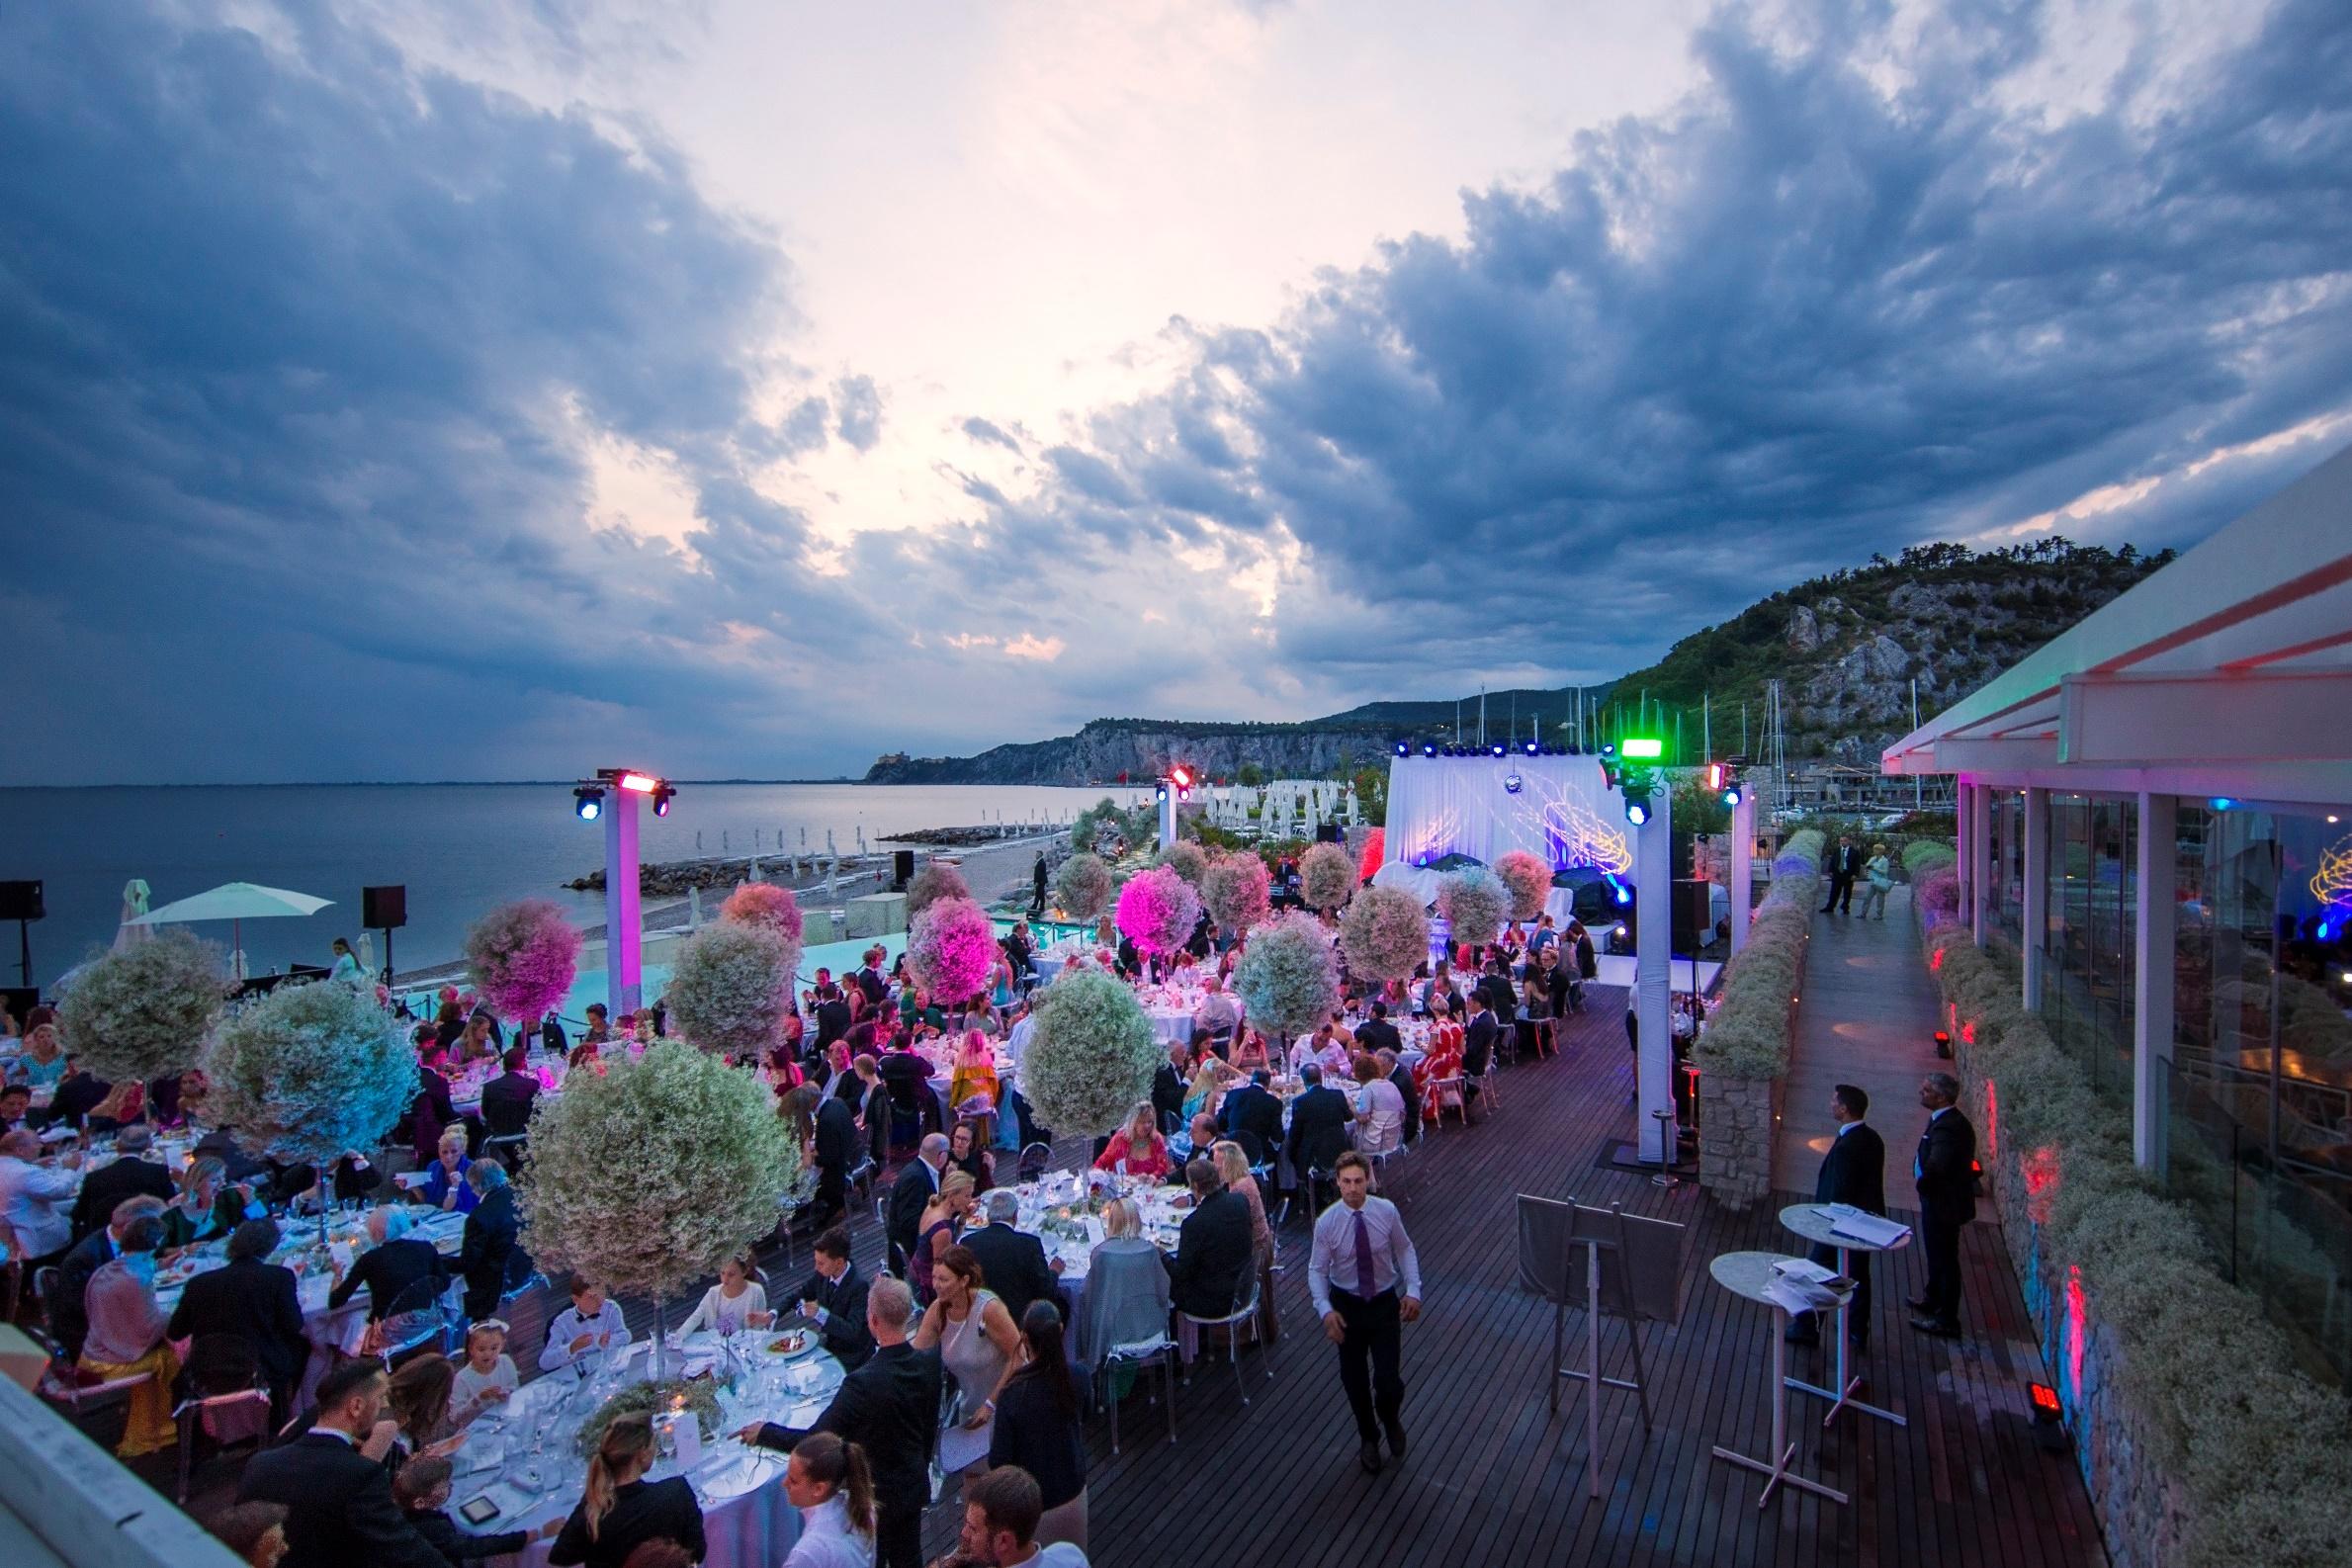 Victoria Swarovski and Werner Muerz Wedding Porto Piccolo, Italy Credit: chris singer | johannes kernmayer